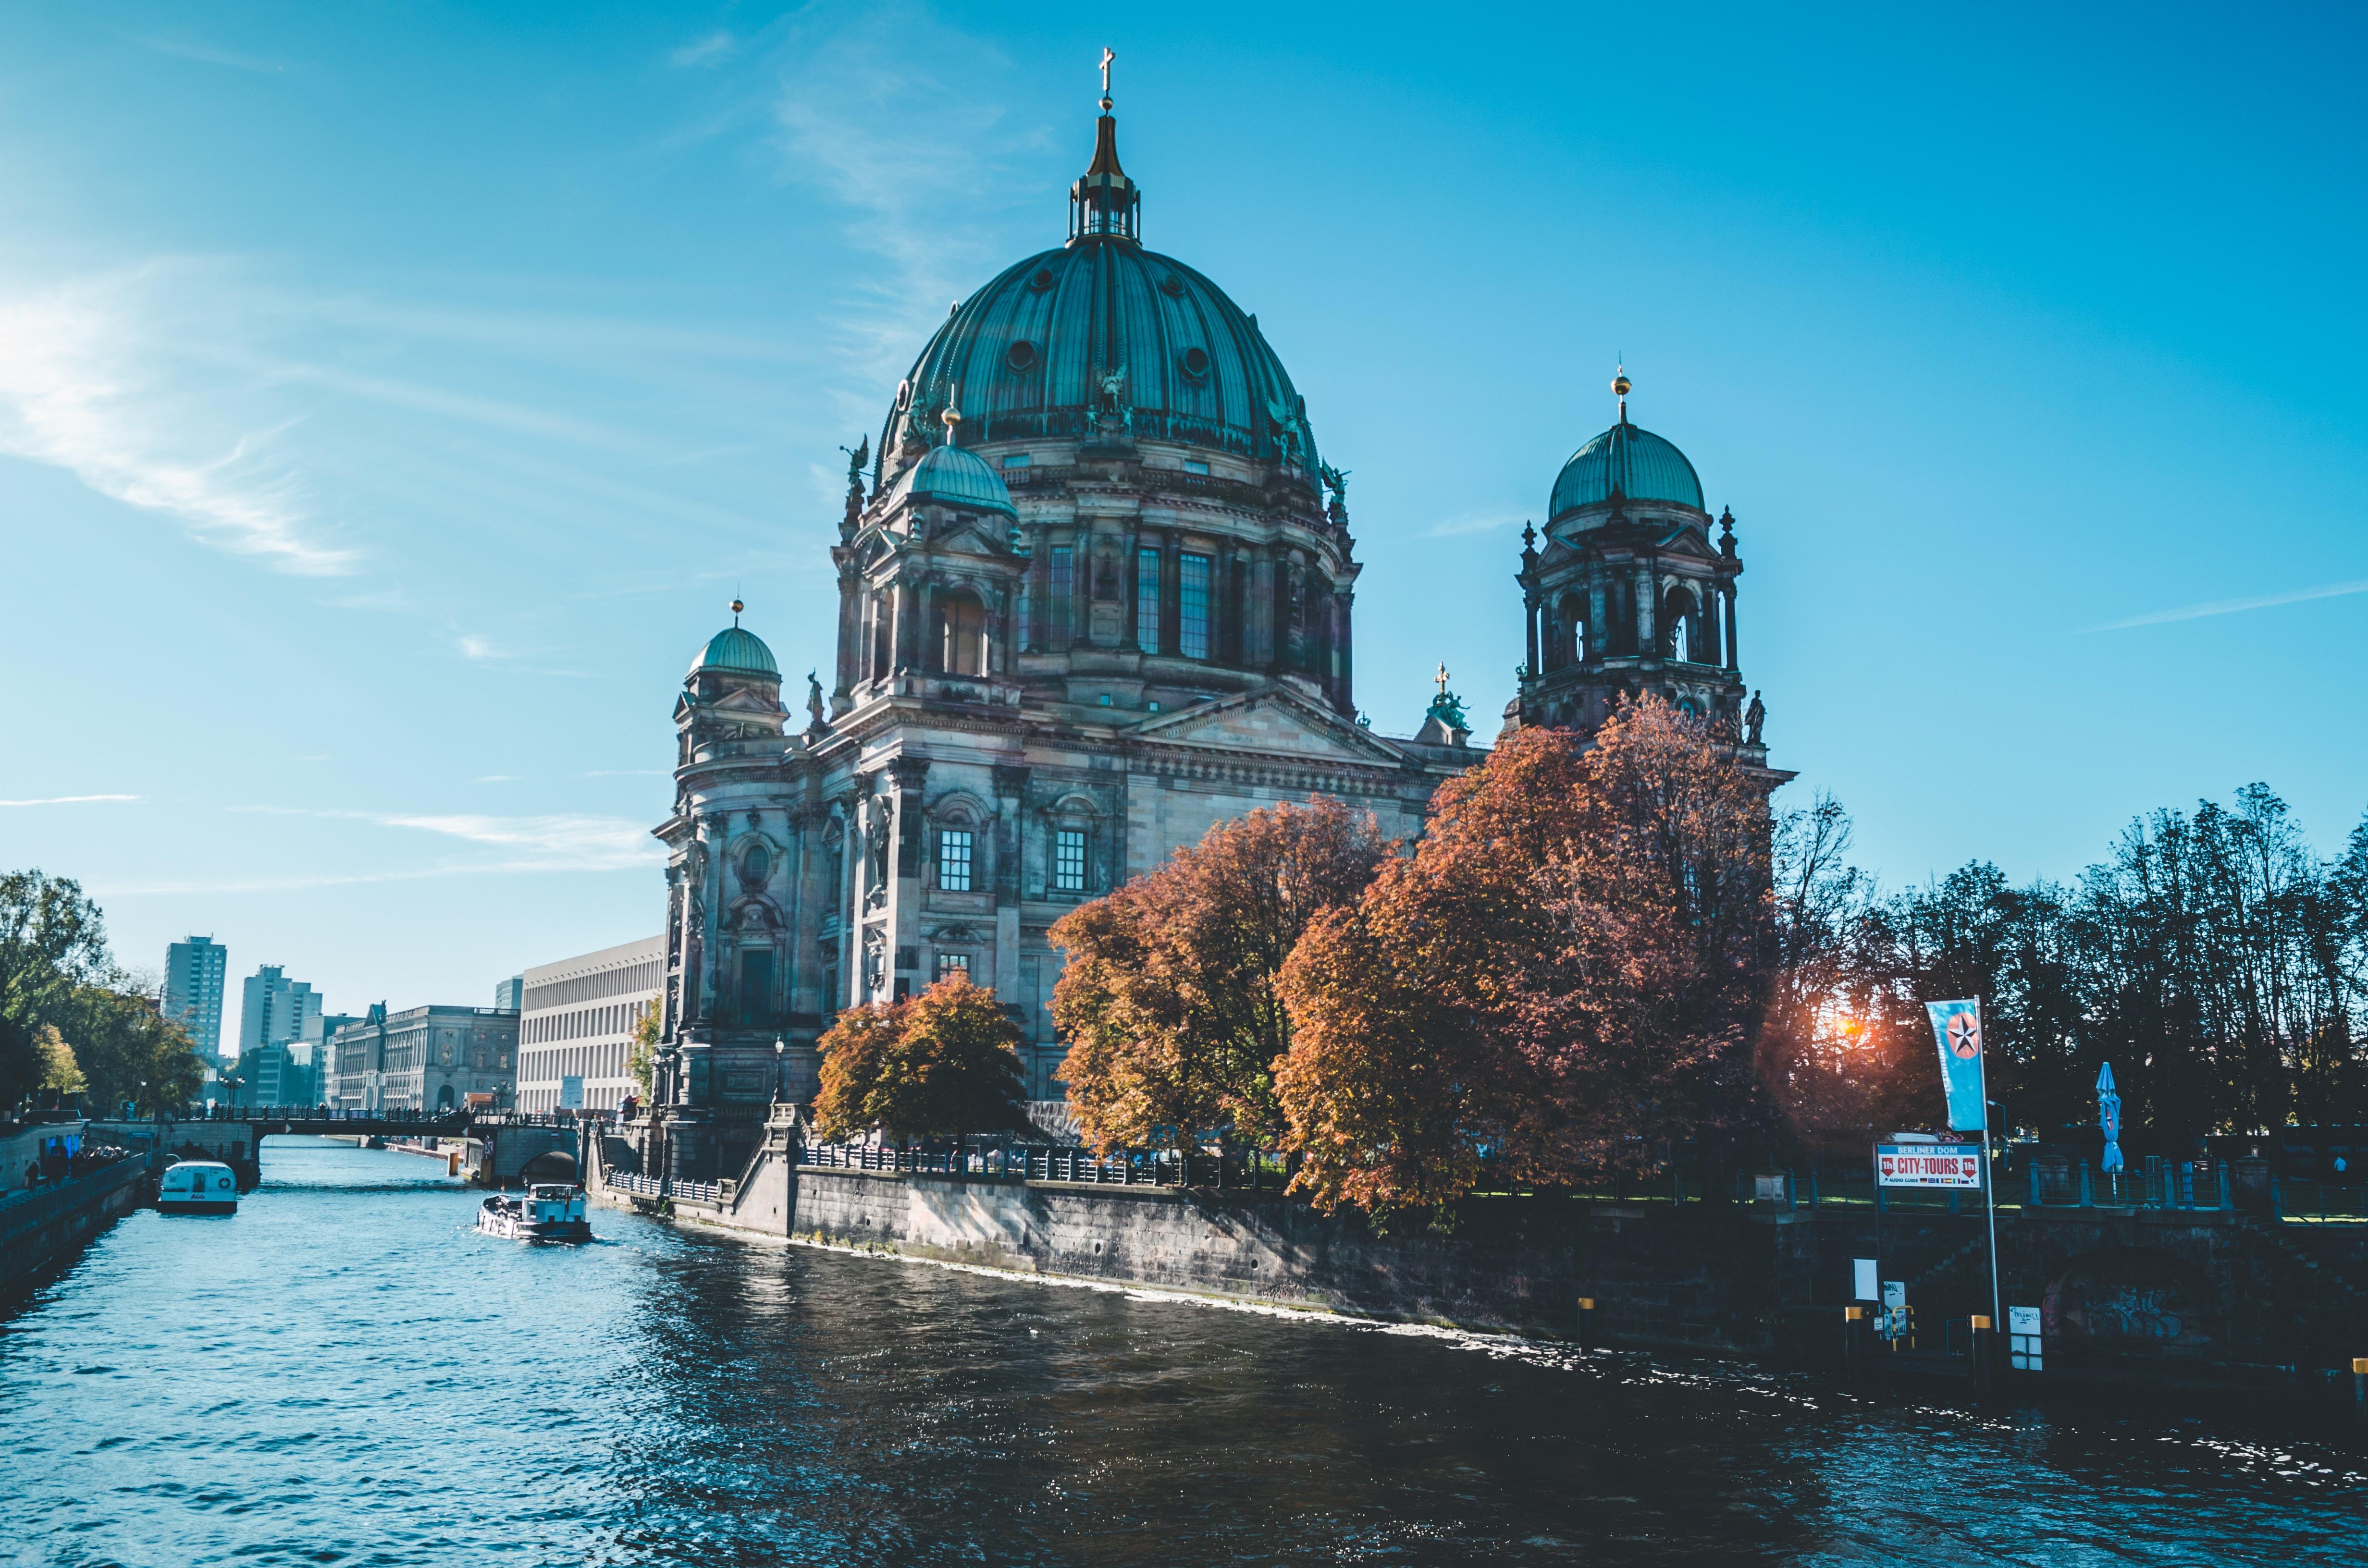 Private Equity Praktikum Berlin Capiton